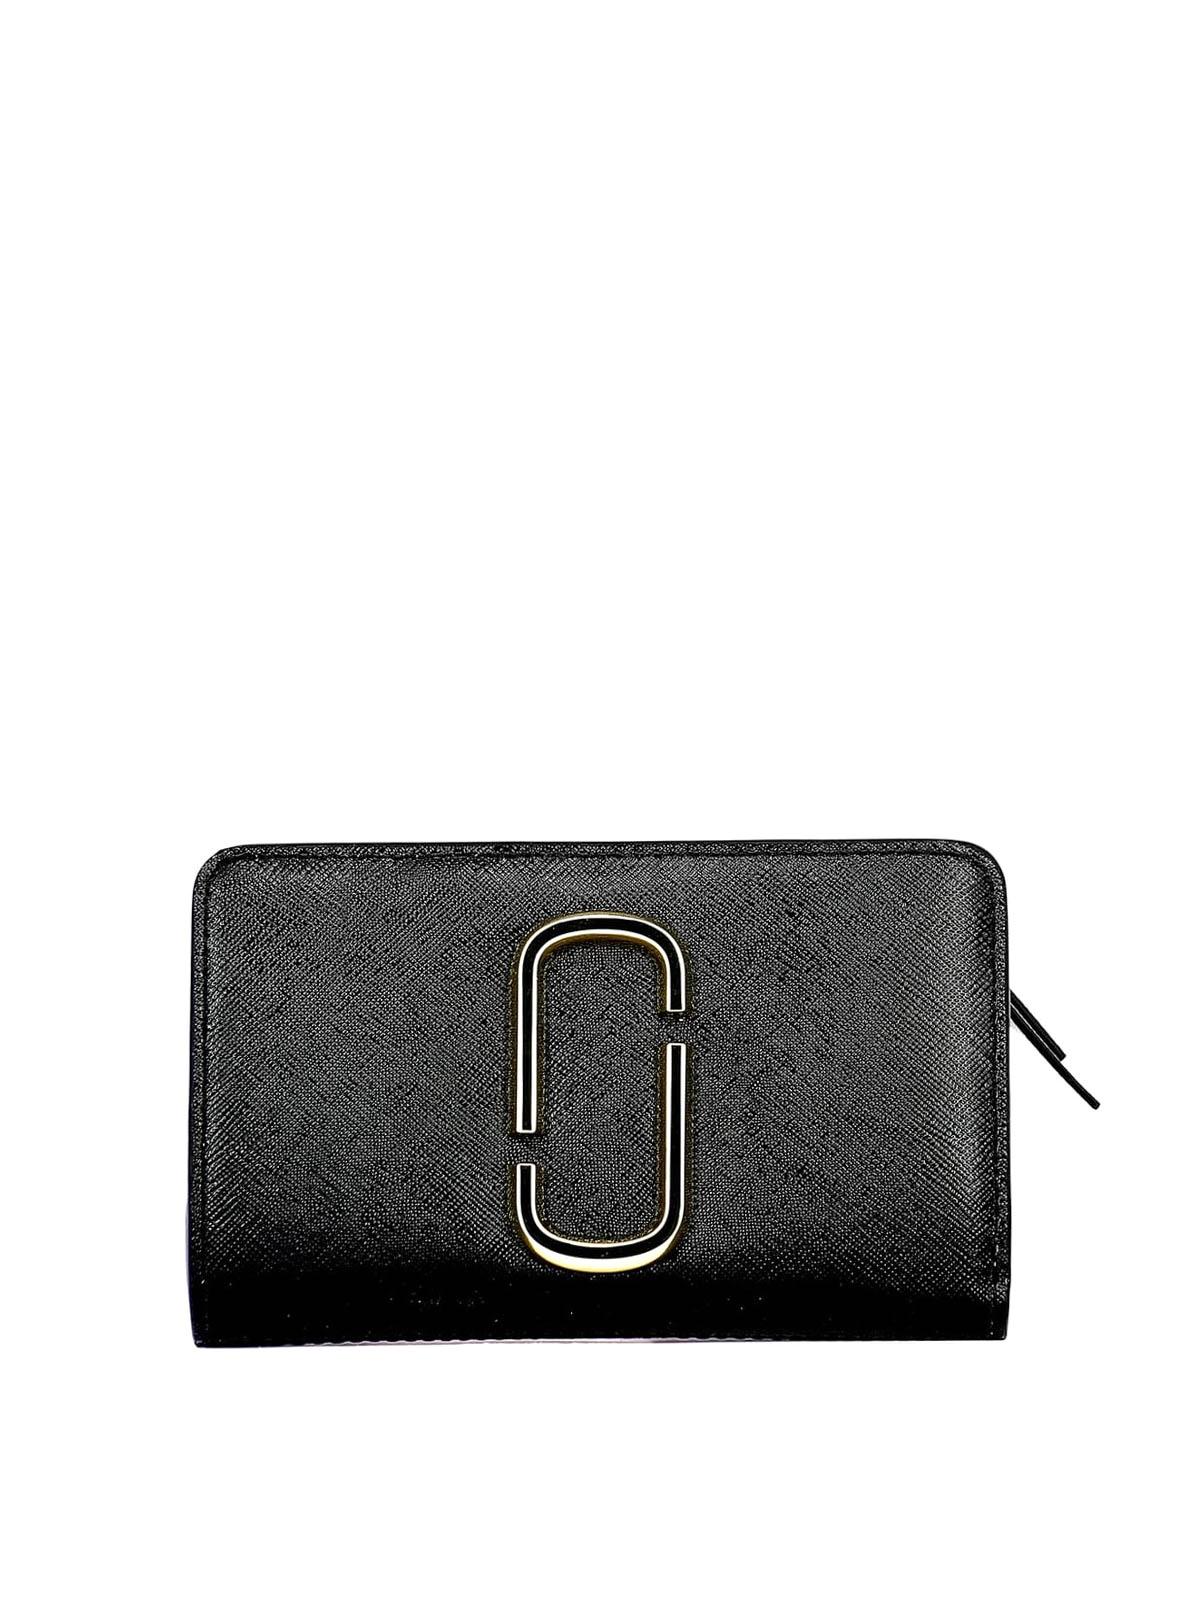 online retailer 26a8e 9b689 Marc Jacobs - Portafoglio Snapshot nero e bianco ...